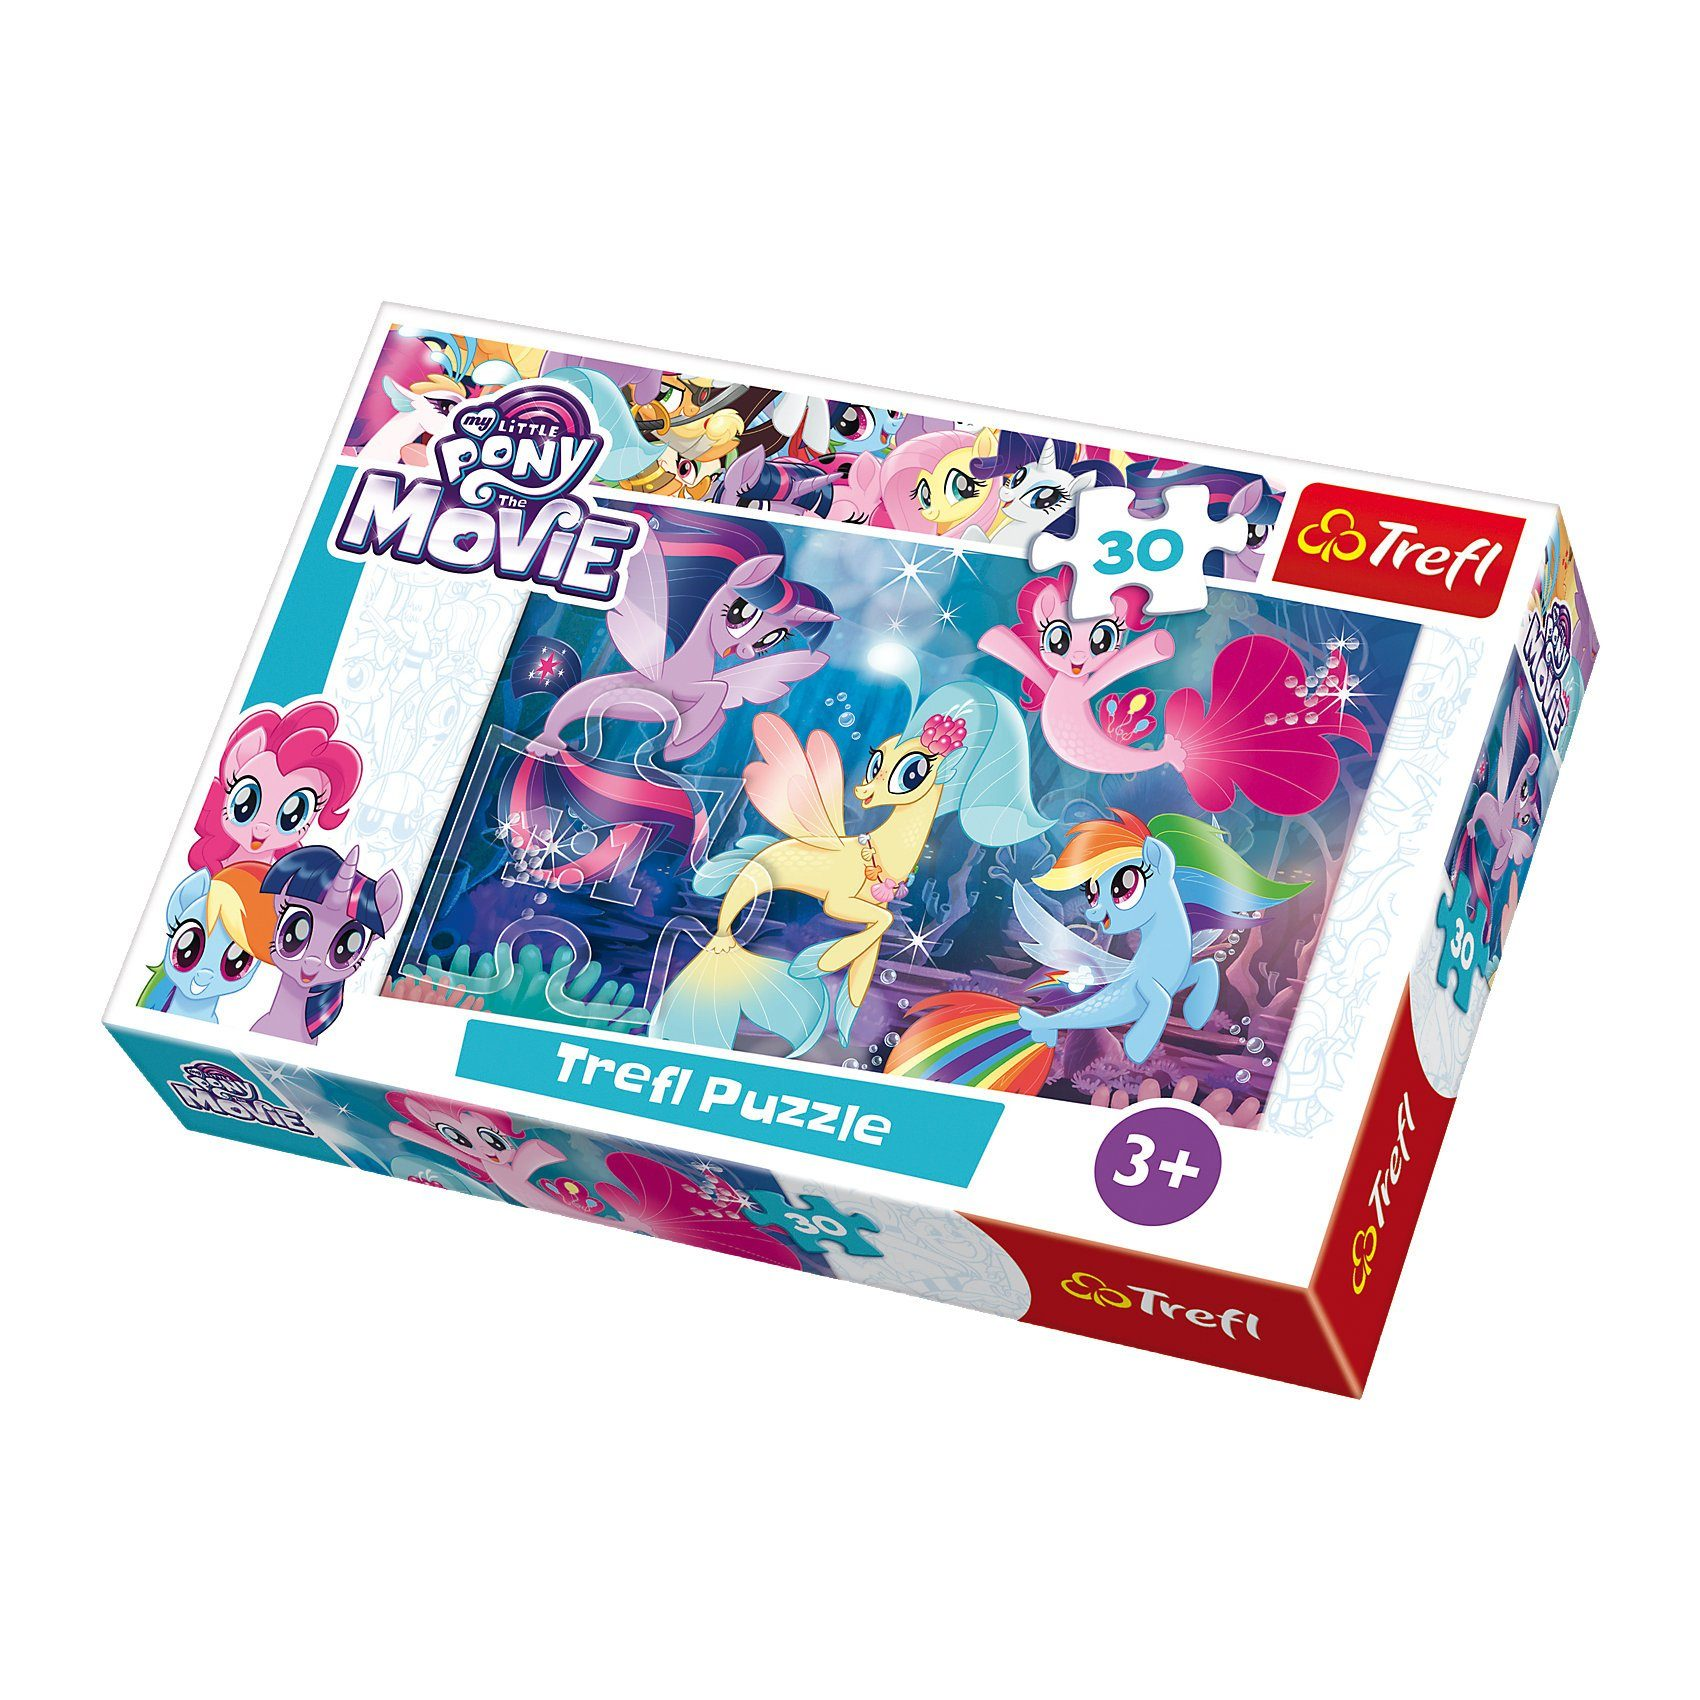 Trefl Puzzle 30 Teile - My little Pony